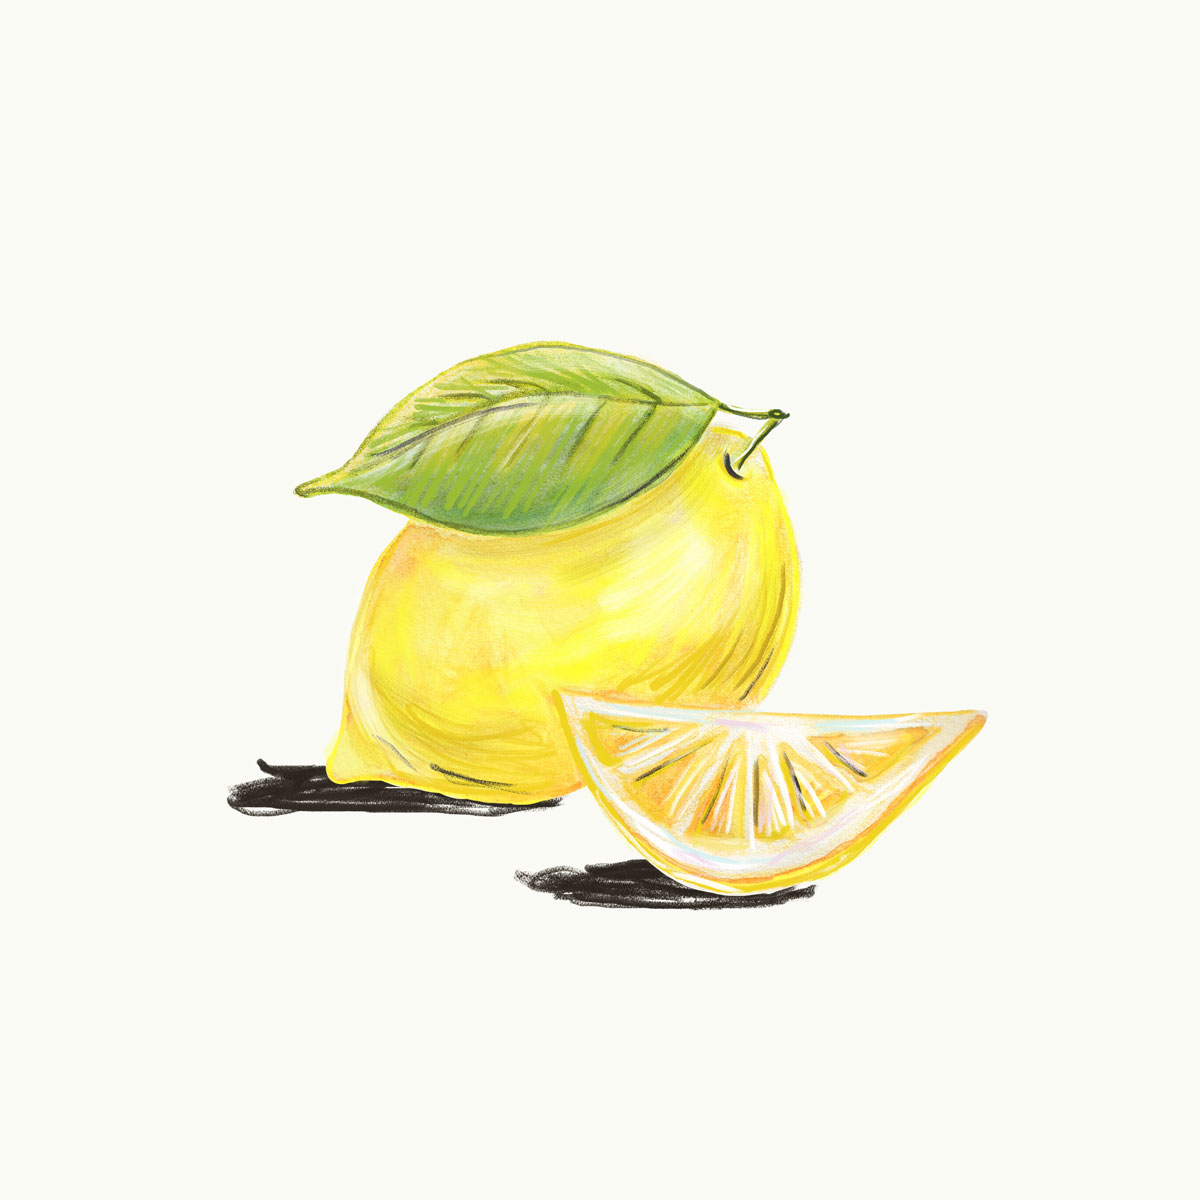 016-Lemon.jpg